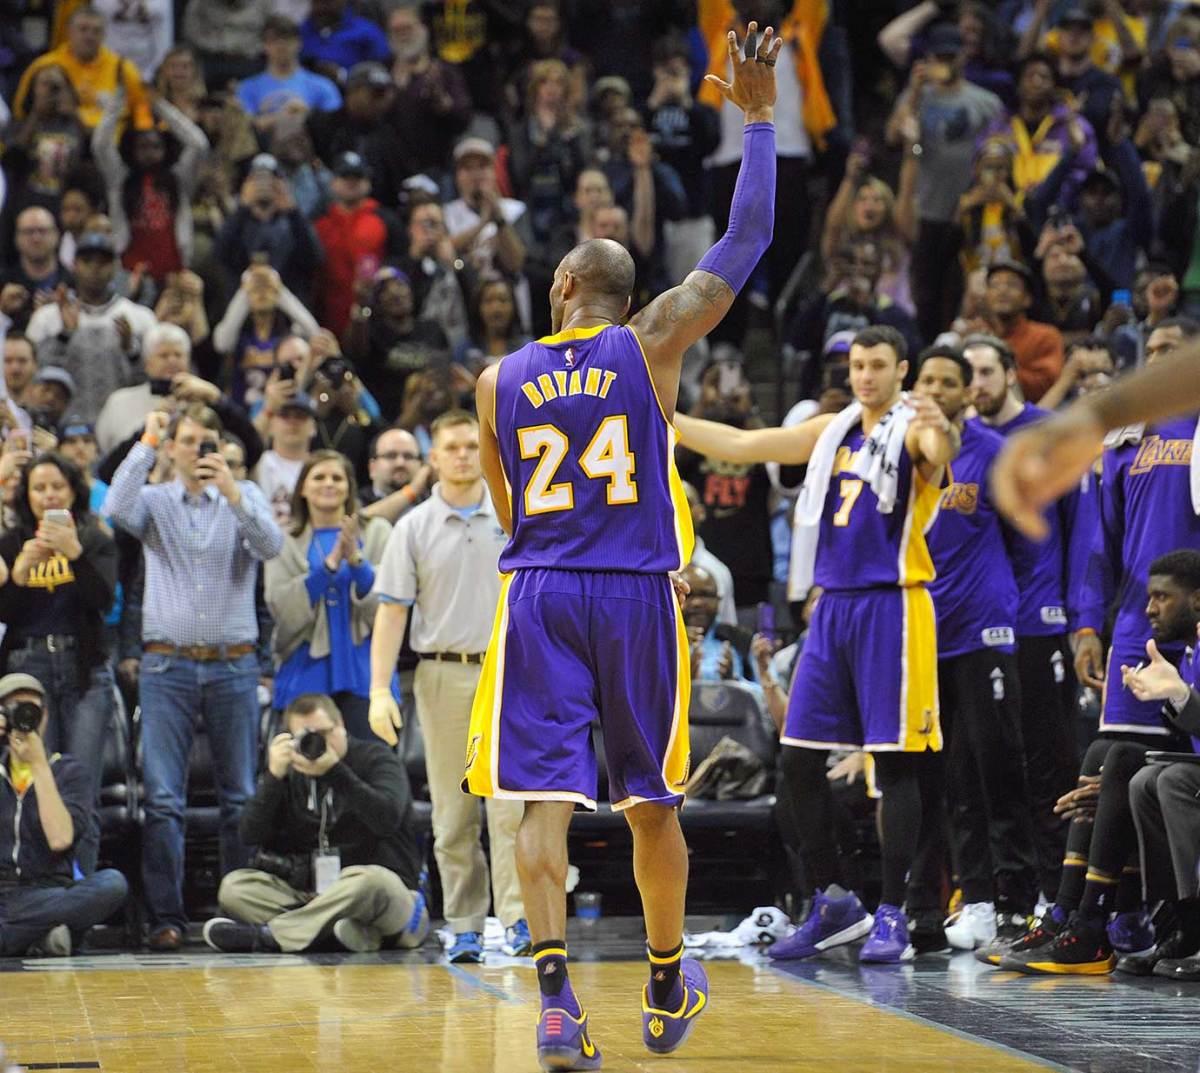 The Night in Sports feb 24-512175268_master.jpg